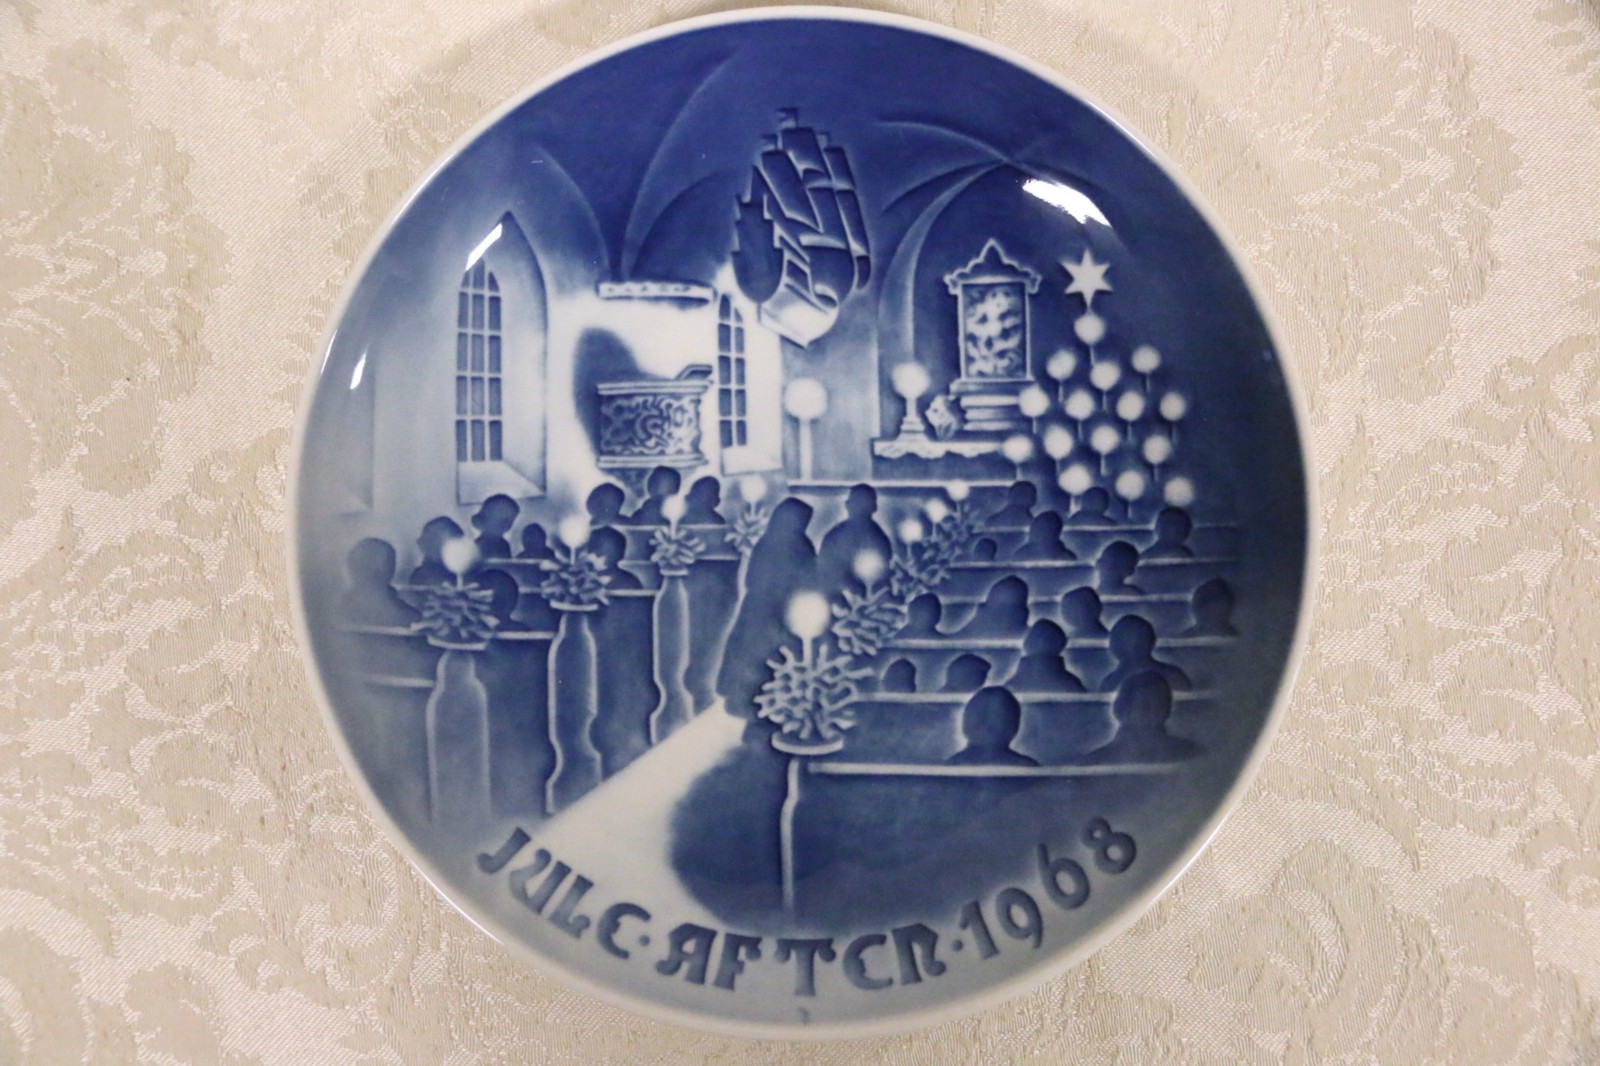 1968 royal copenhagen christmas plate jule after bg christmas in church blue - Royal Copenhagen Christmas Plates